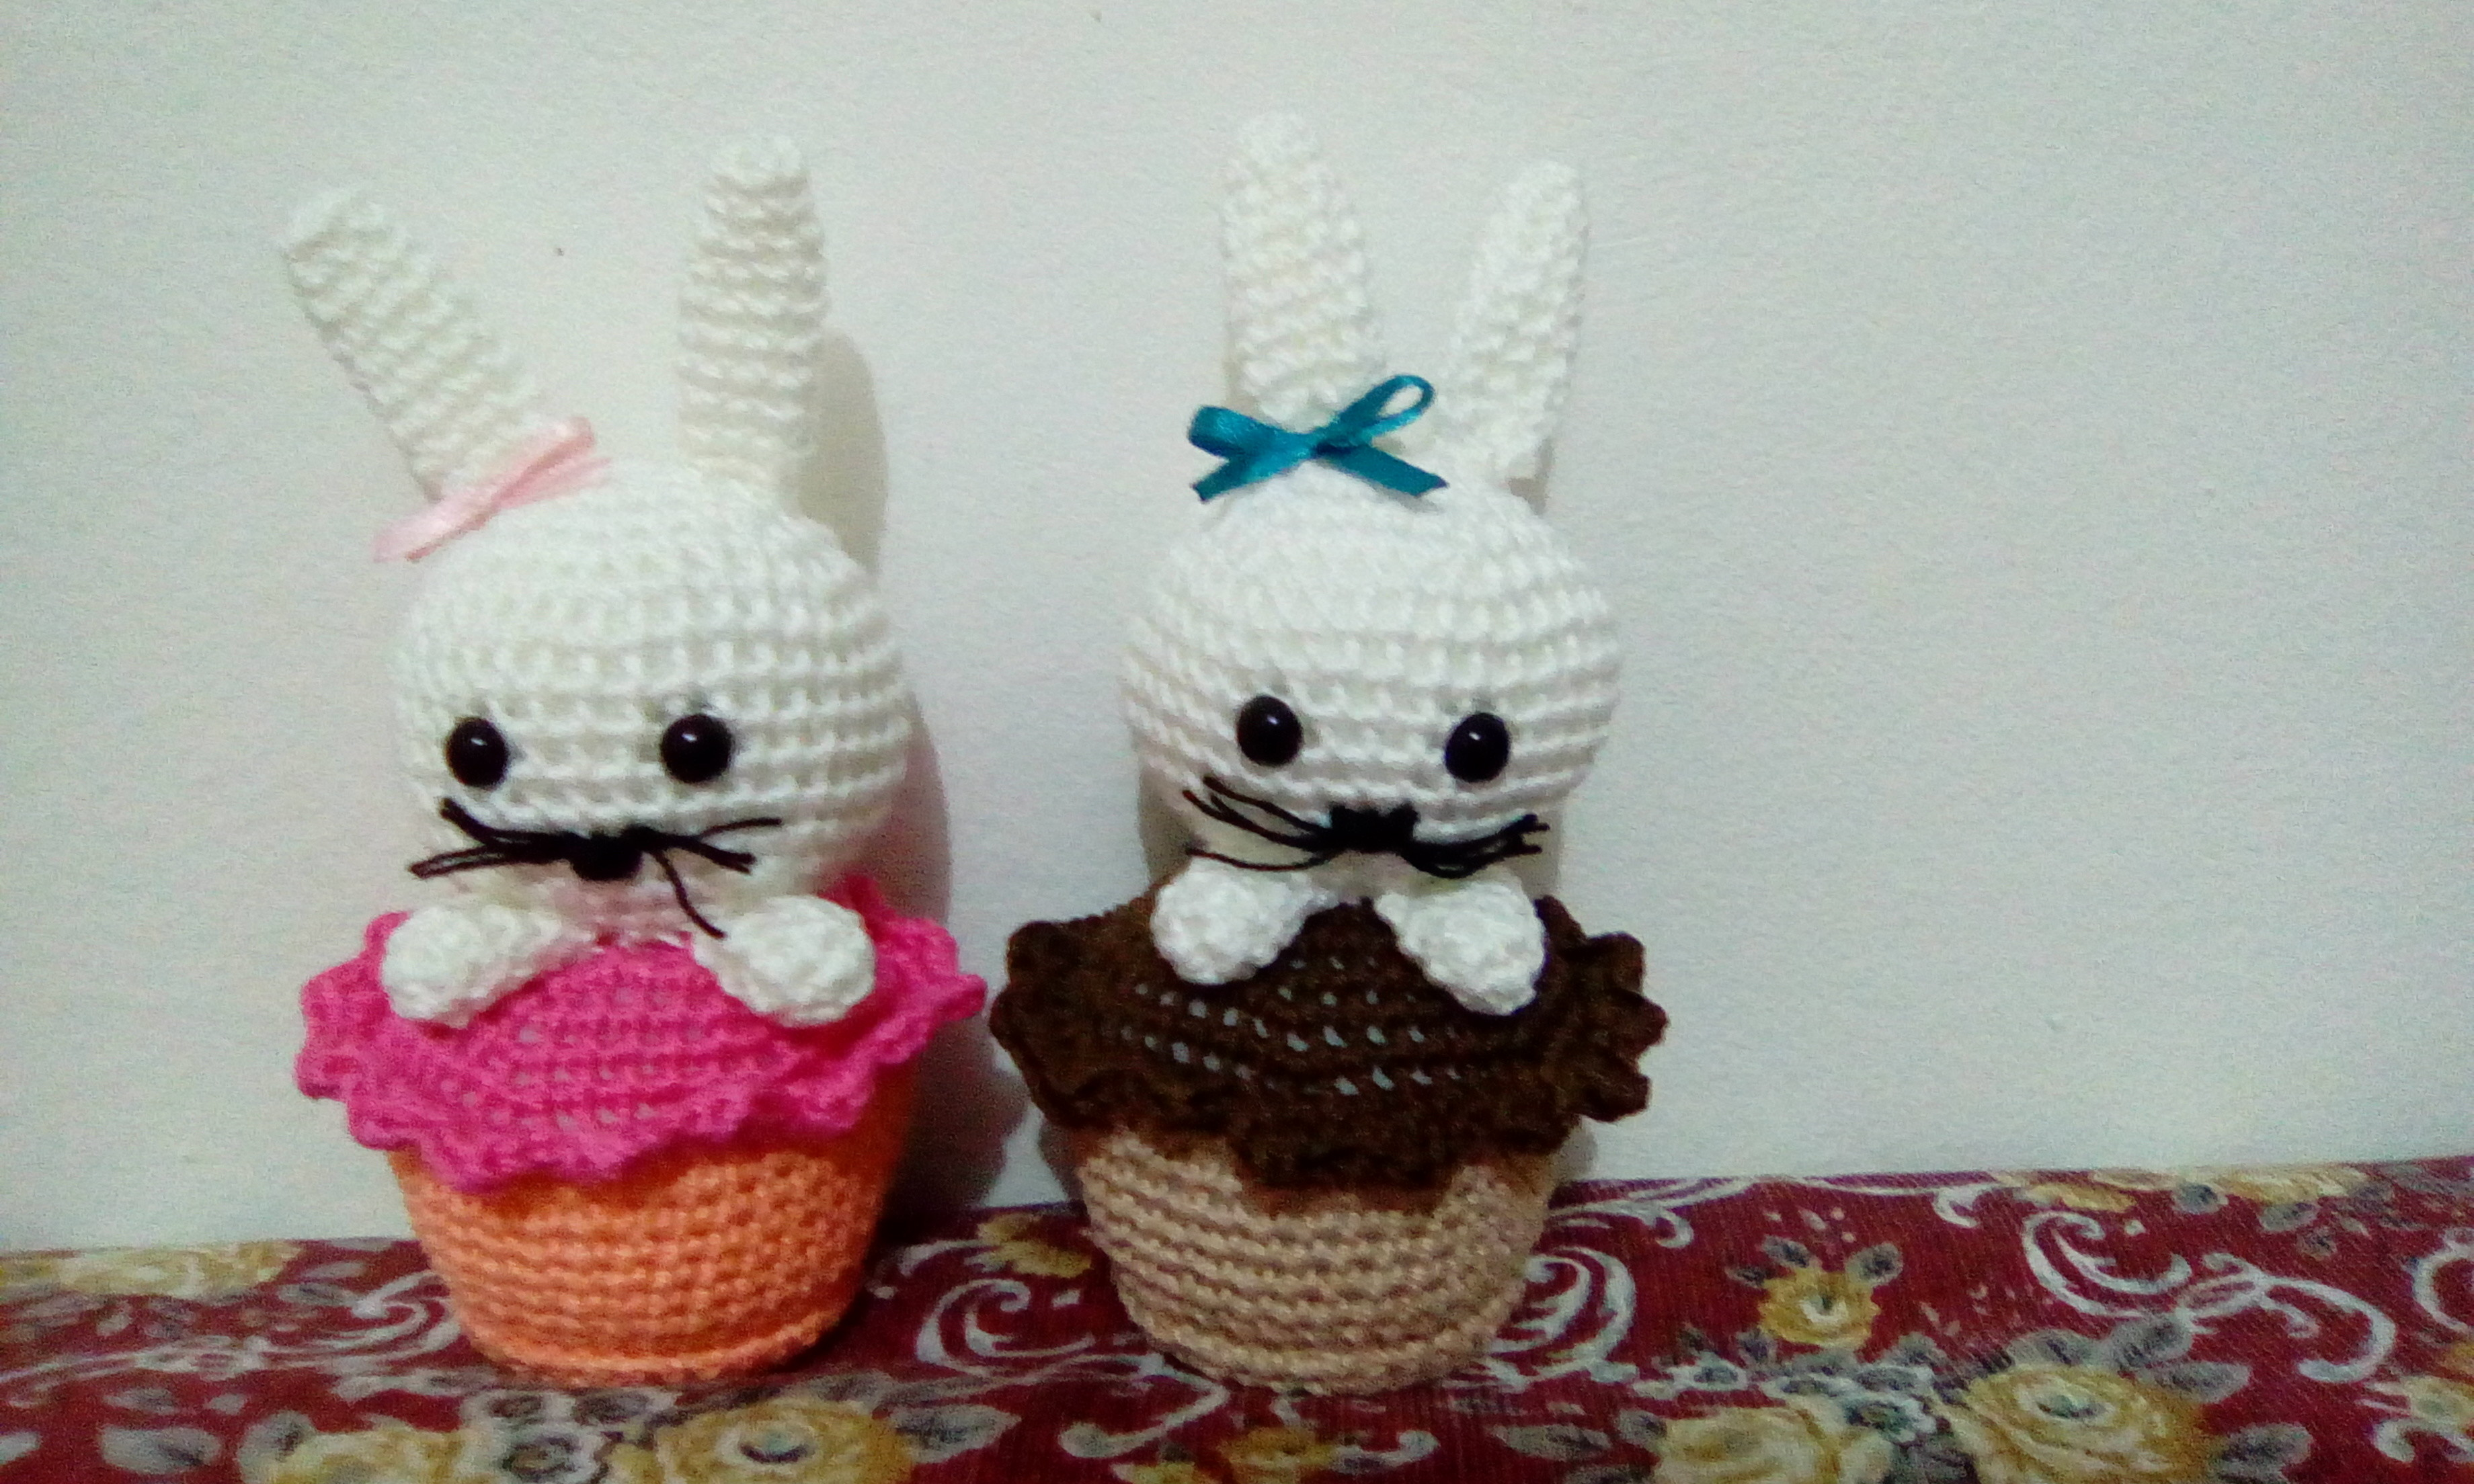 How to crochet a cupcake/ 3d cupcake/ amigurumi cupcake Part 1/2 ... | 2208x3680